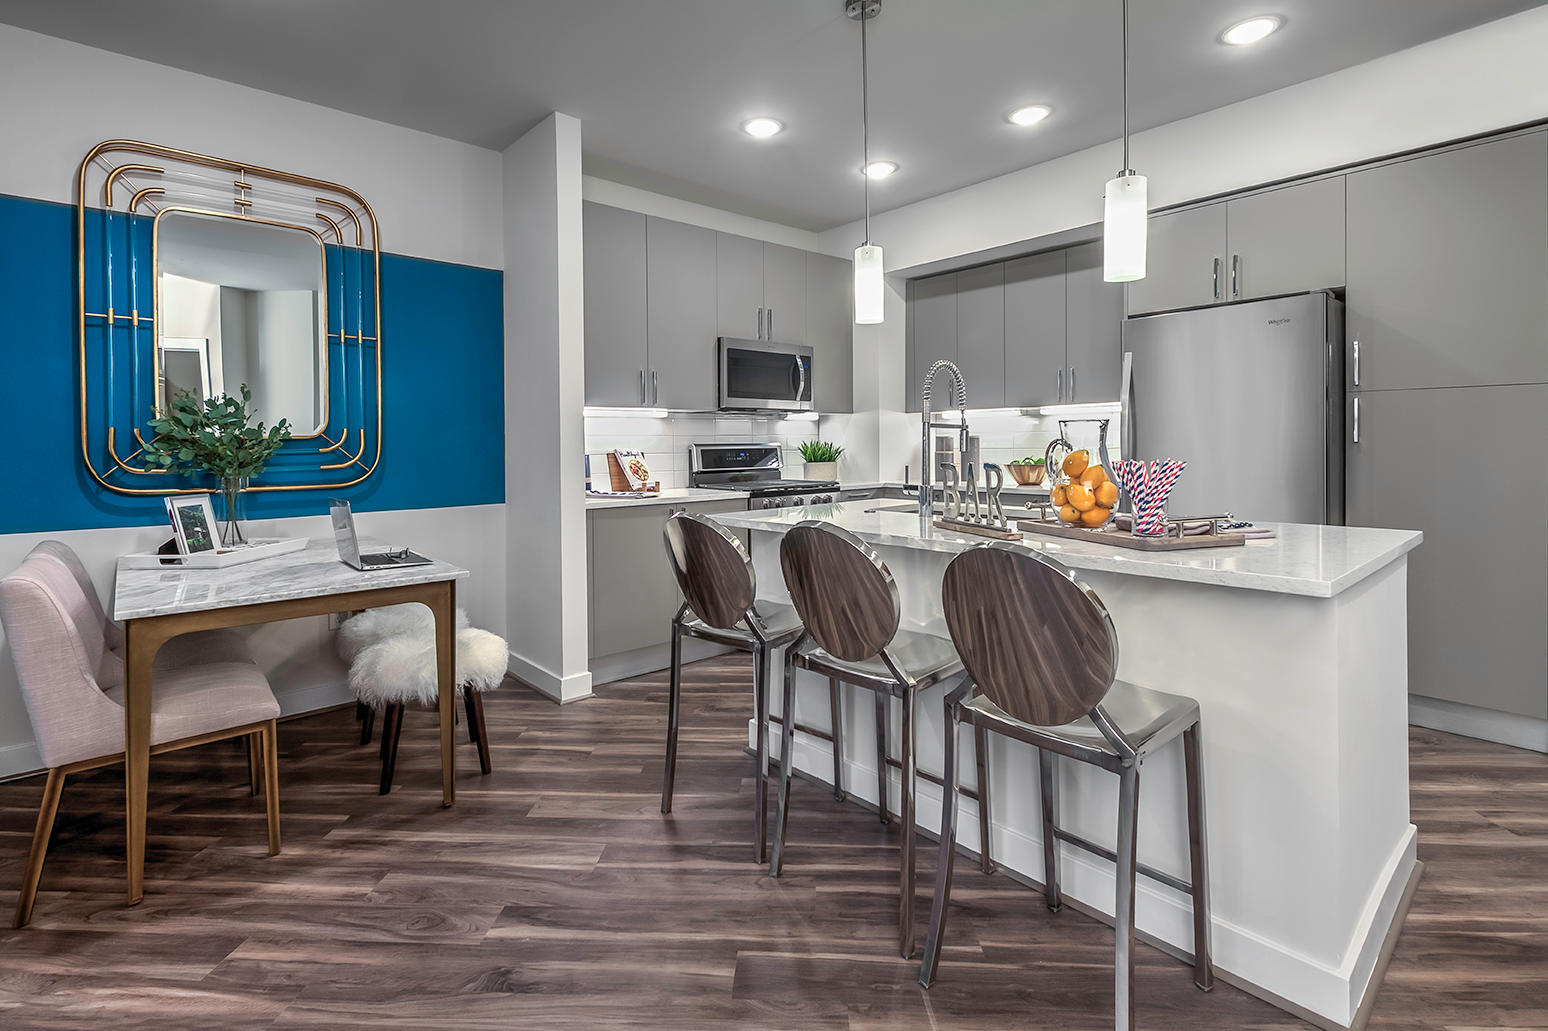 Camden Washingtonian Apartments image 1